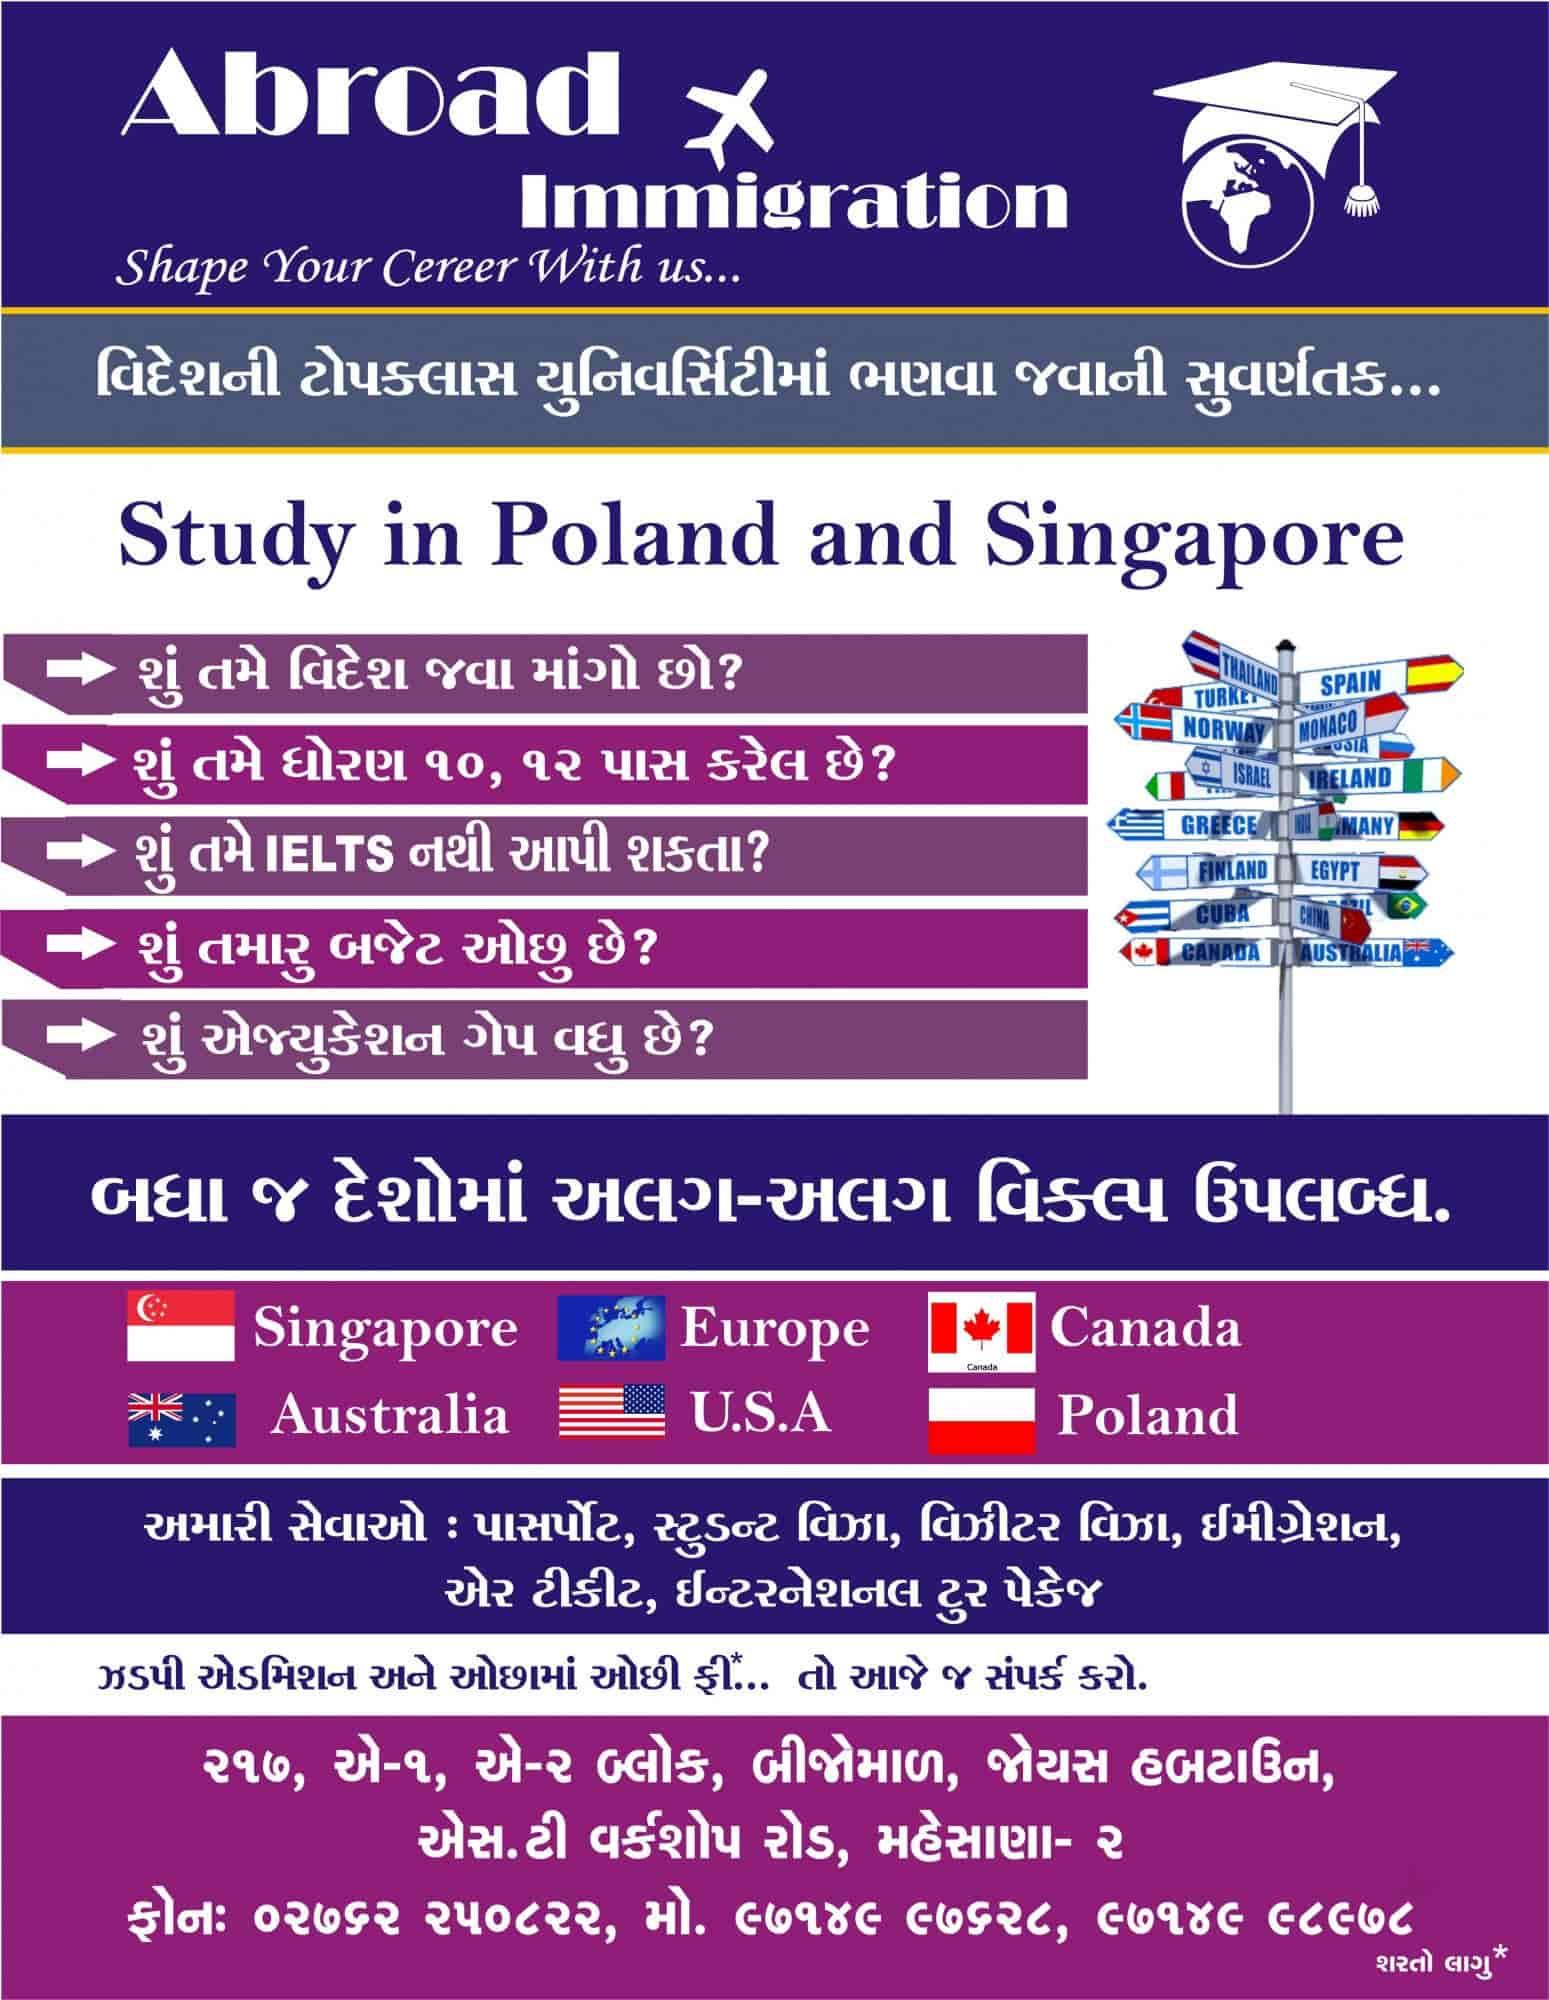 Abroad Immigration, Mehsana Industrial Estate - Visa